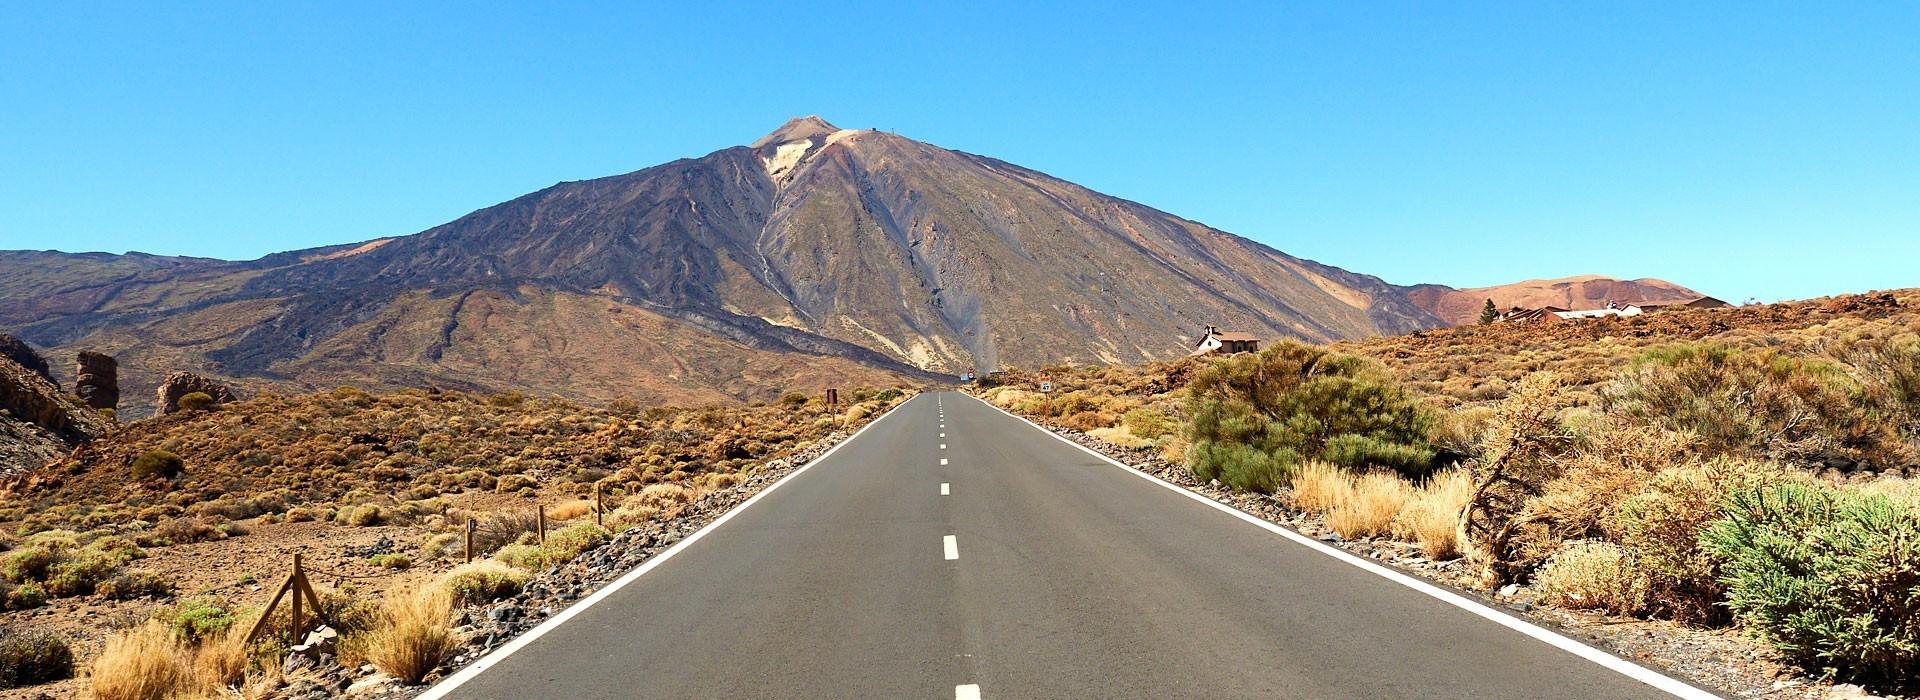 Tenerife ▸ Experiencias